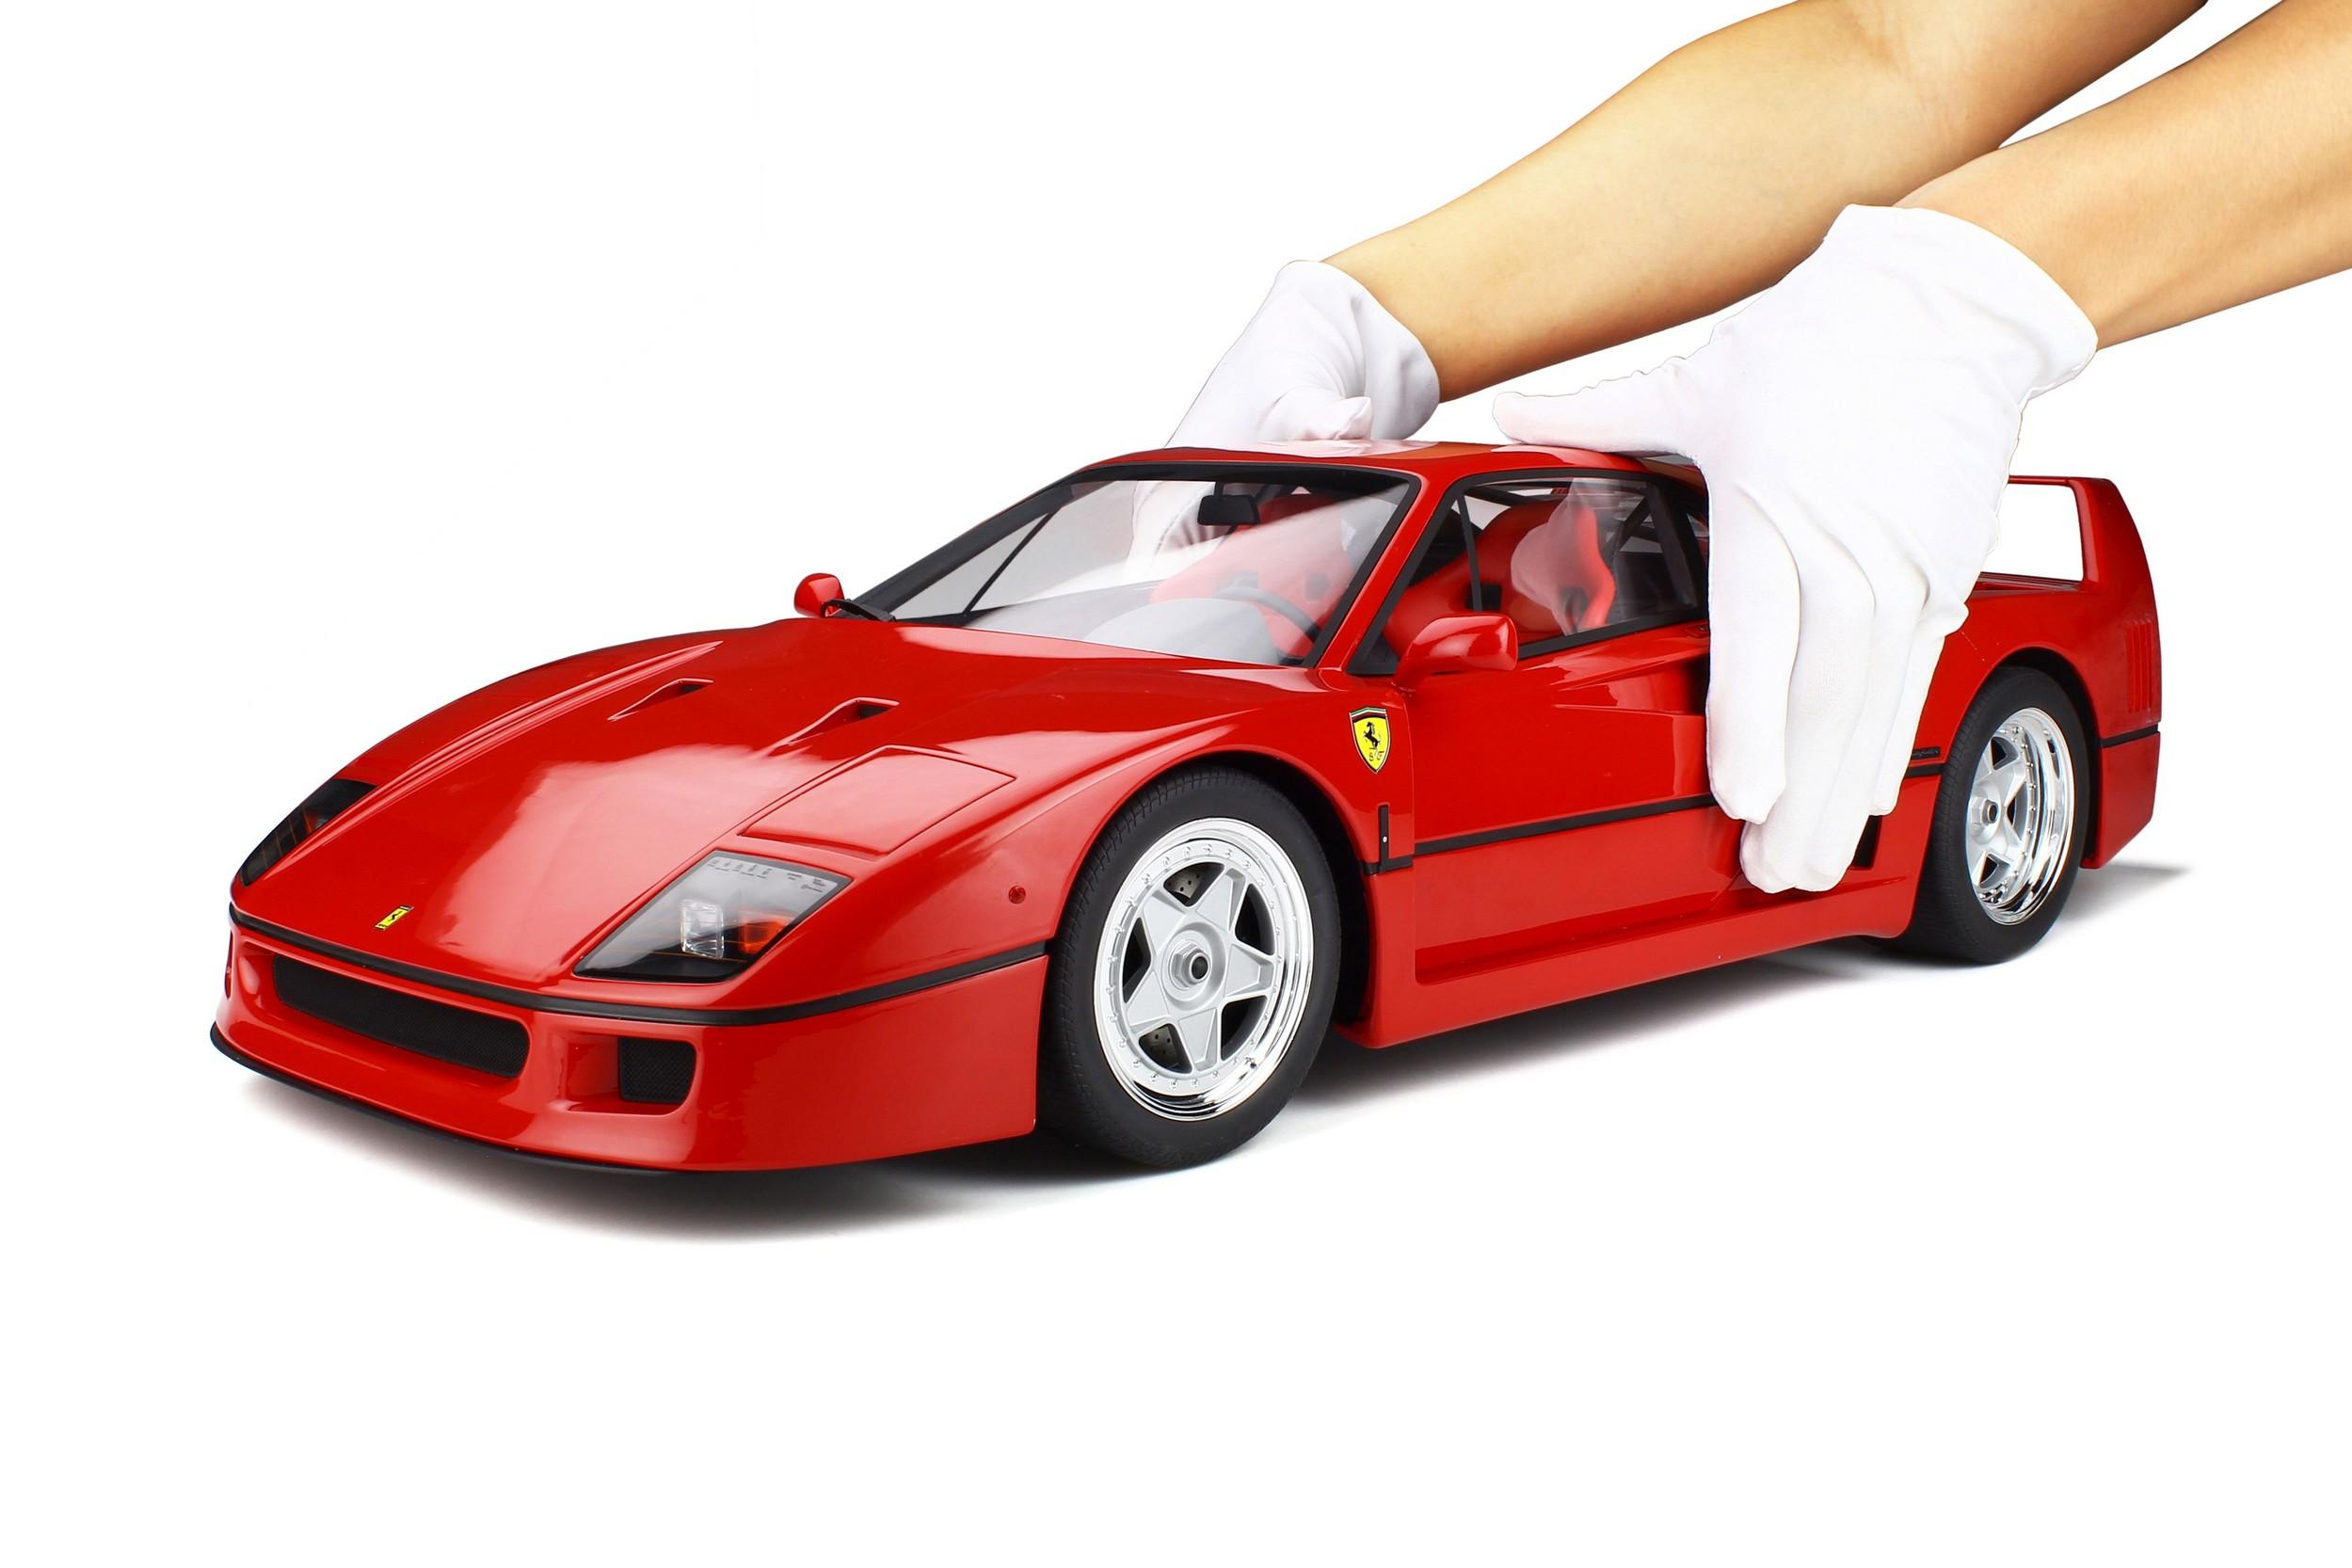 Ferrari F40 Model Car Collection Gt Spirit